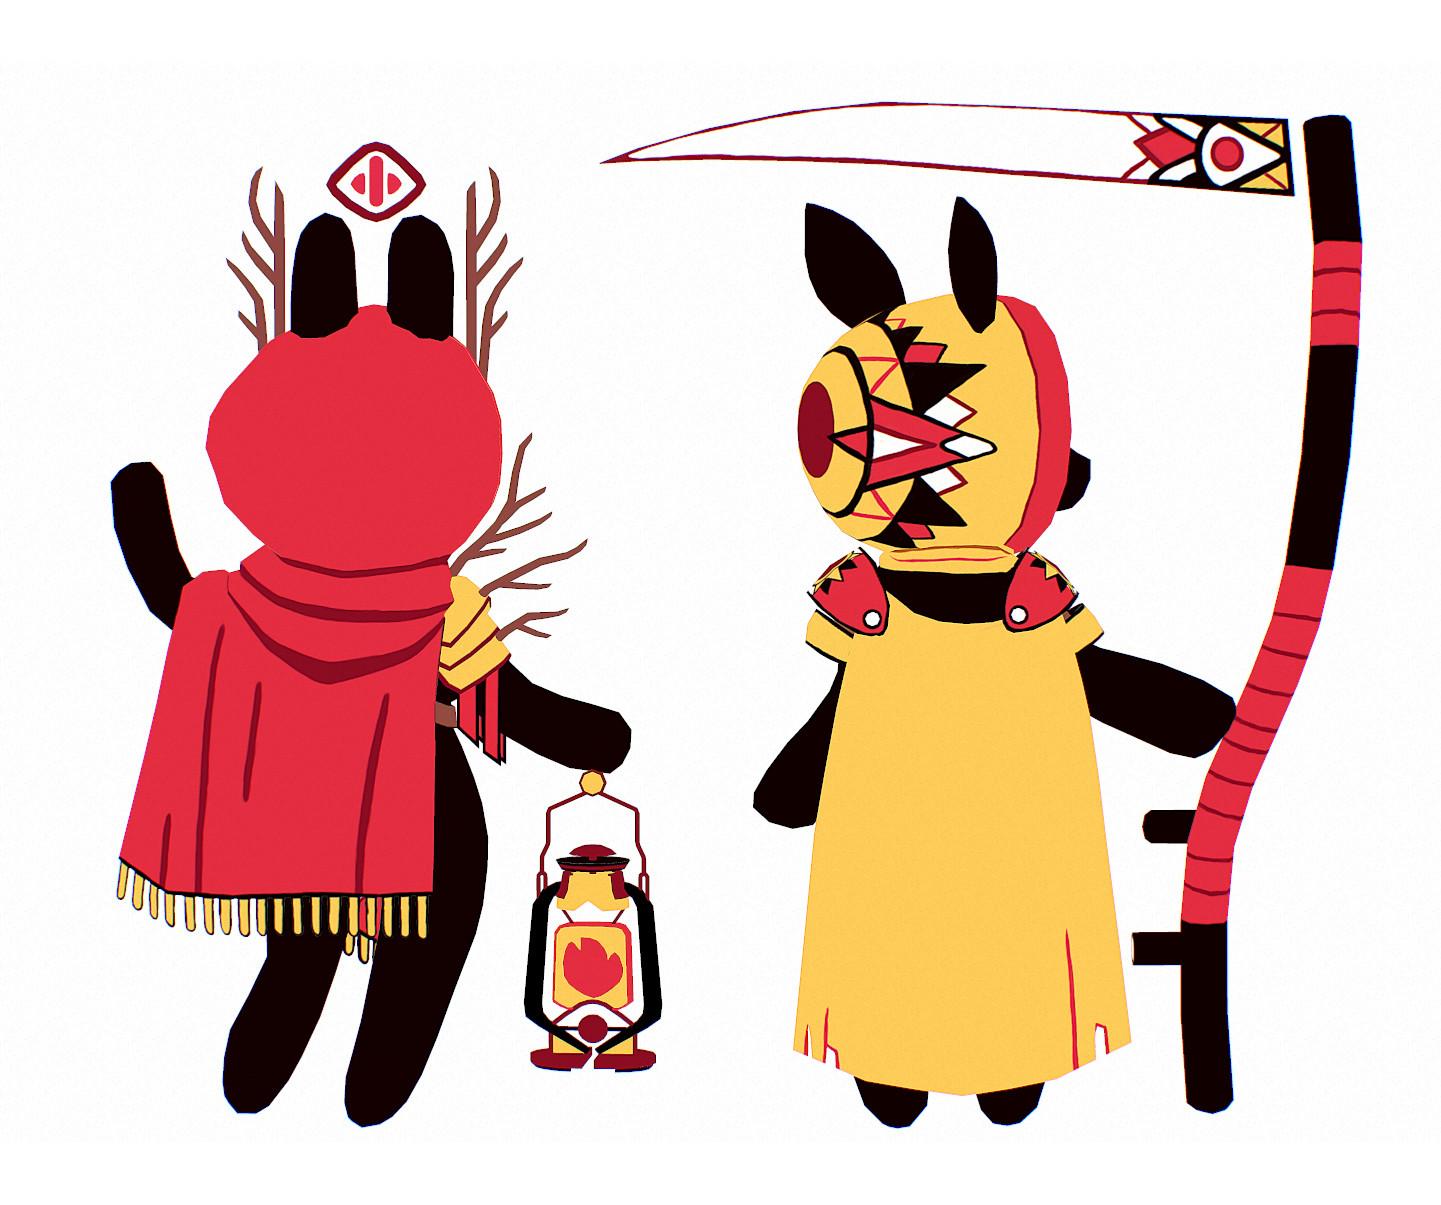 Eren ozel sun doe and bun witch 02 161228